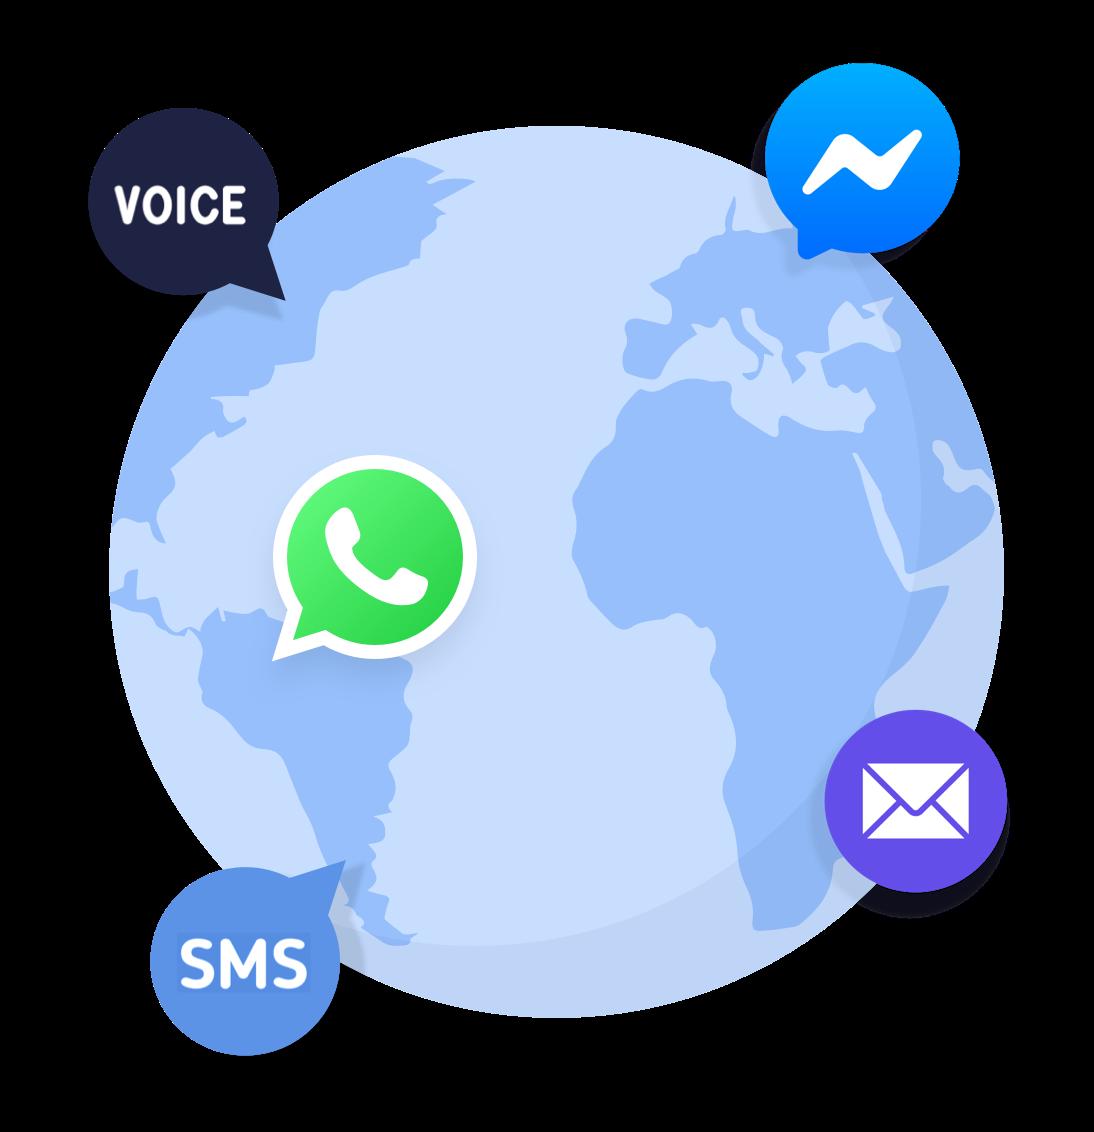 Global telecom services